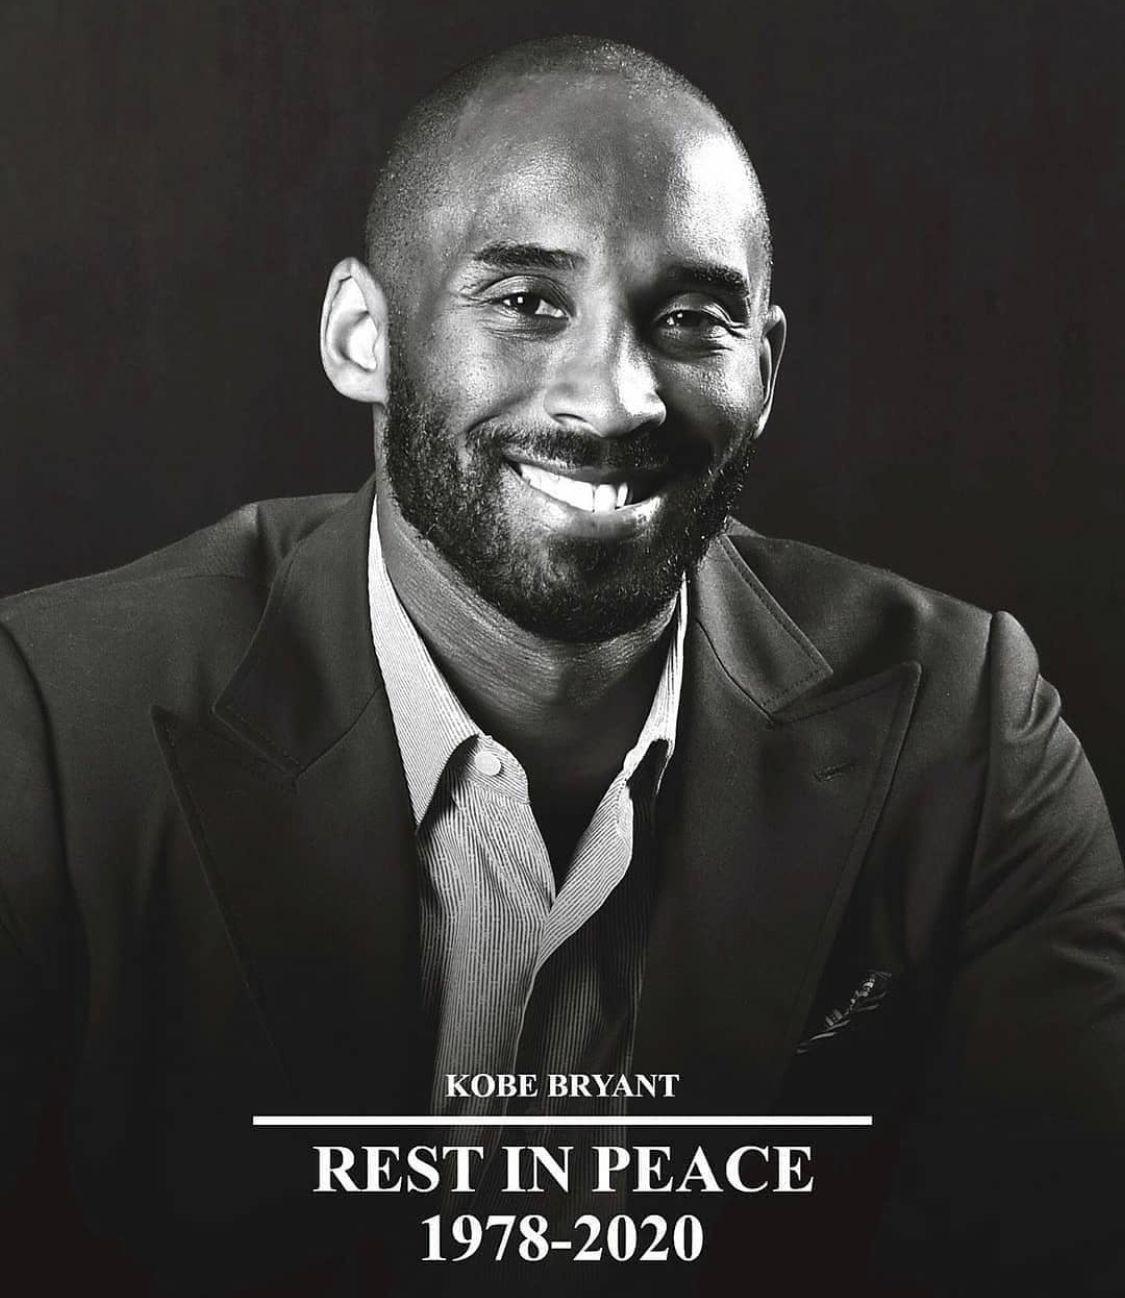 Pin By Zhane212 On Michael Jordan Kobe Bryant Tattoos Kobe Bryant Quotes Young Kobe Bryant